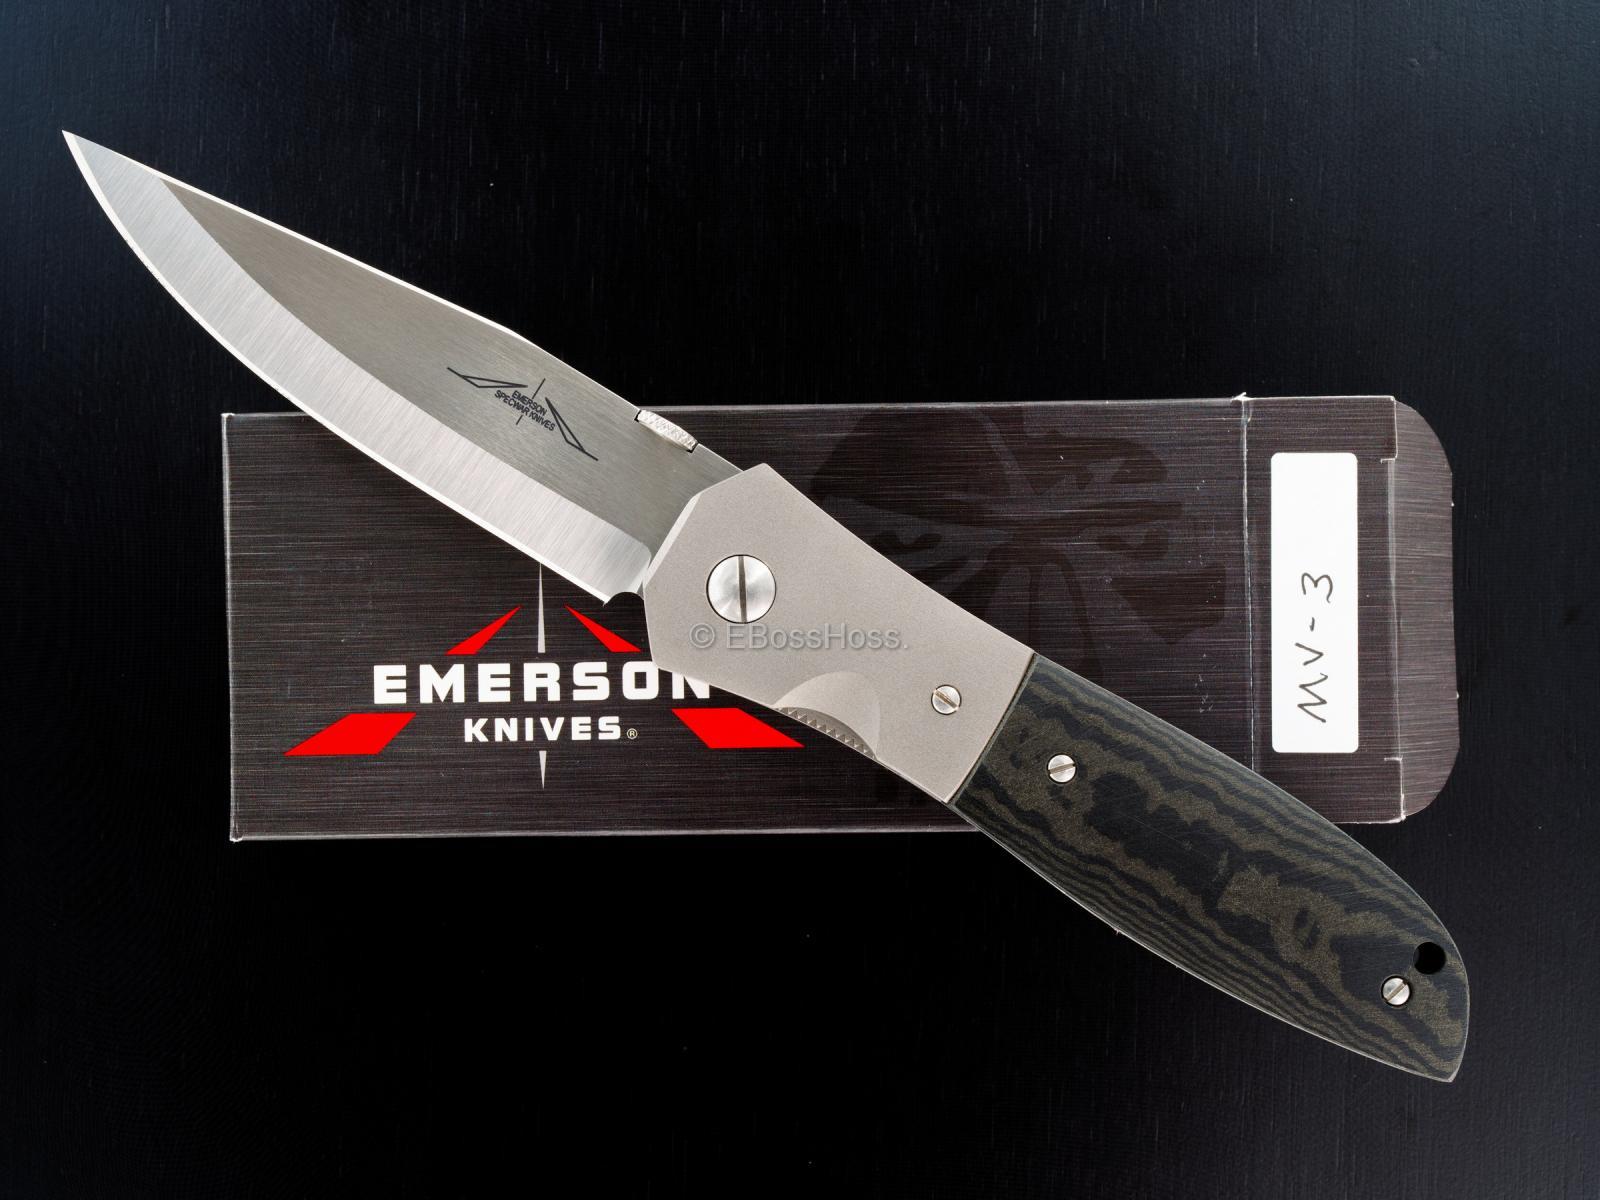 Ernie Emerson Custom MV-3 (aka Viper 3)